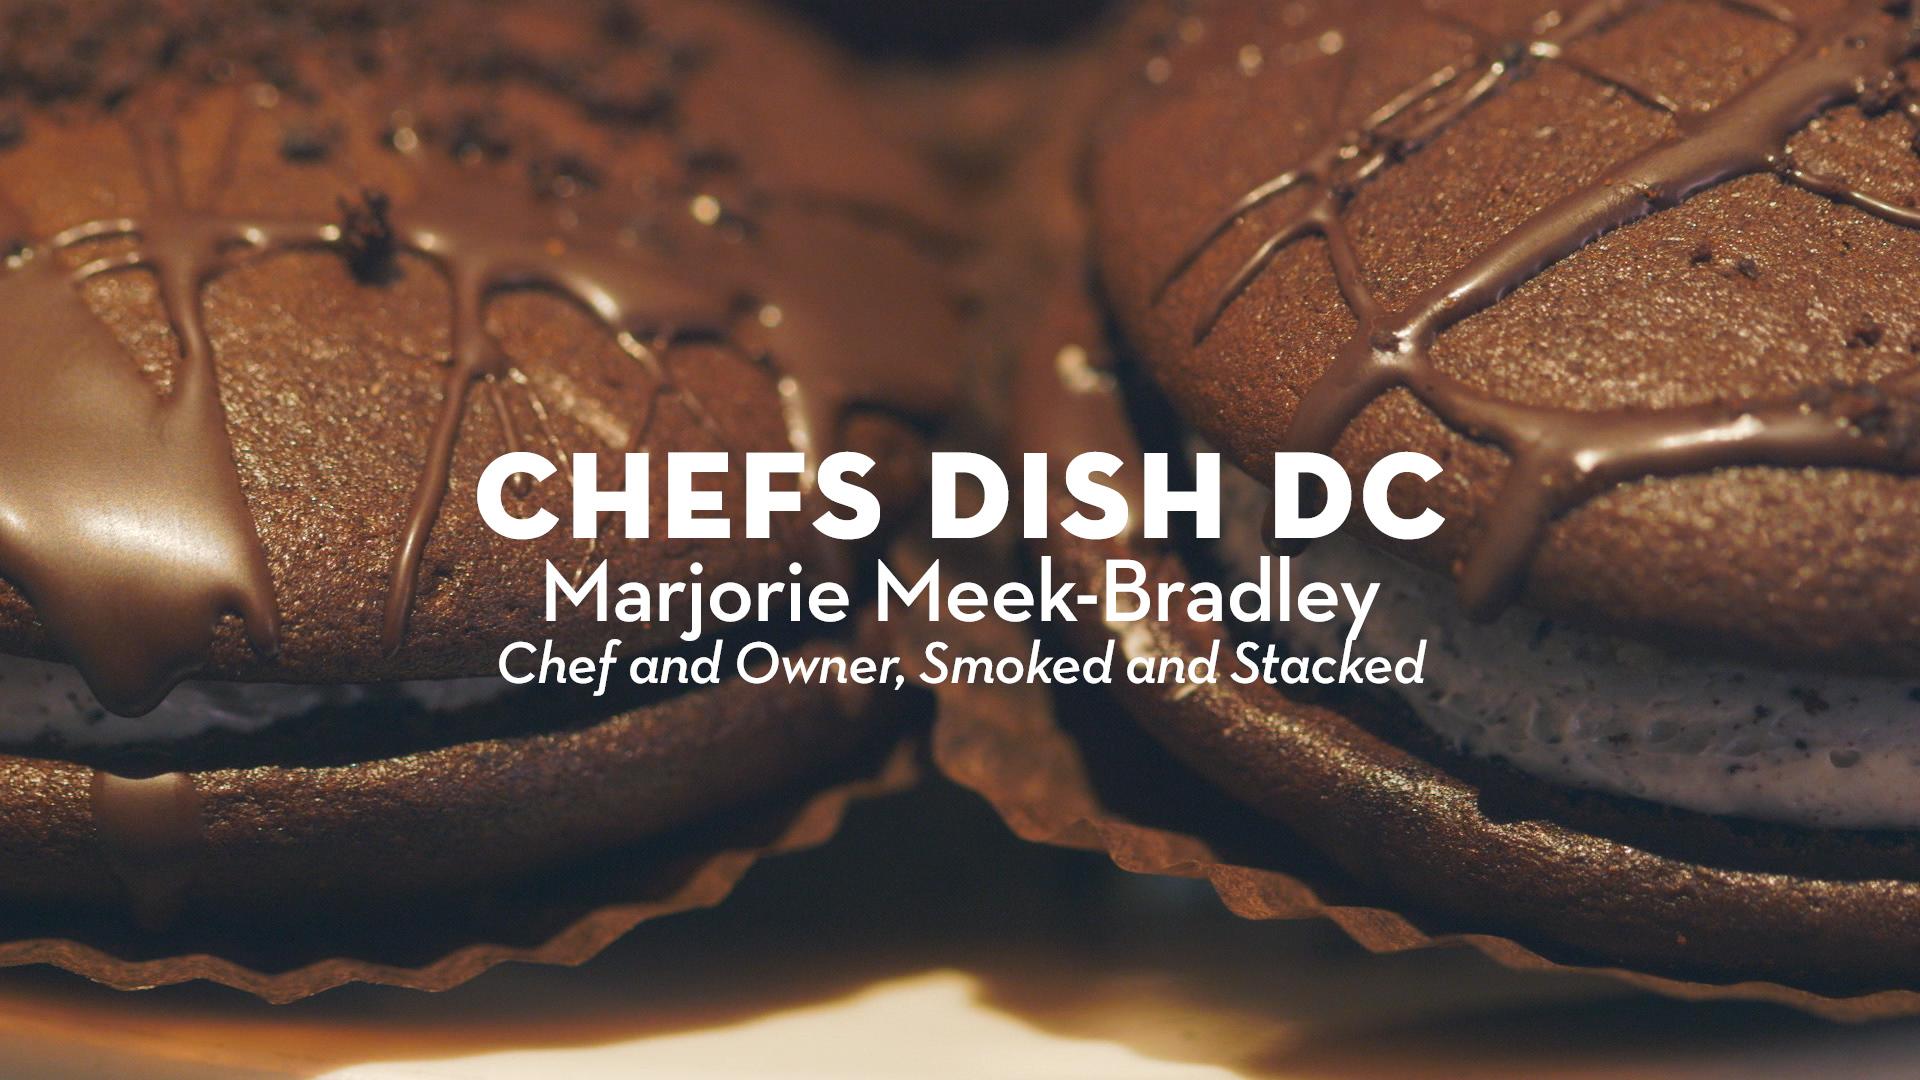 Chefs Dish DC | Chef Marjorie Meek-Bradley